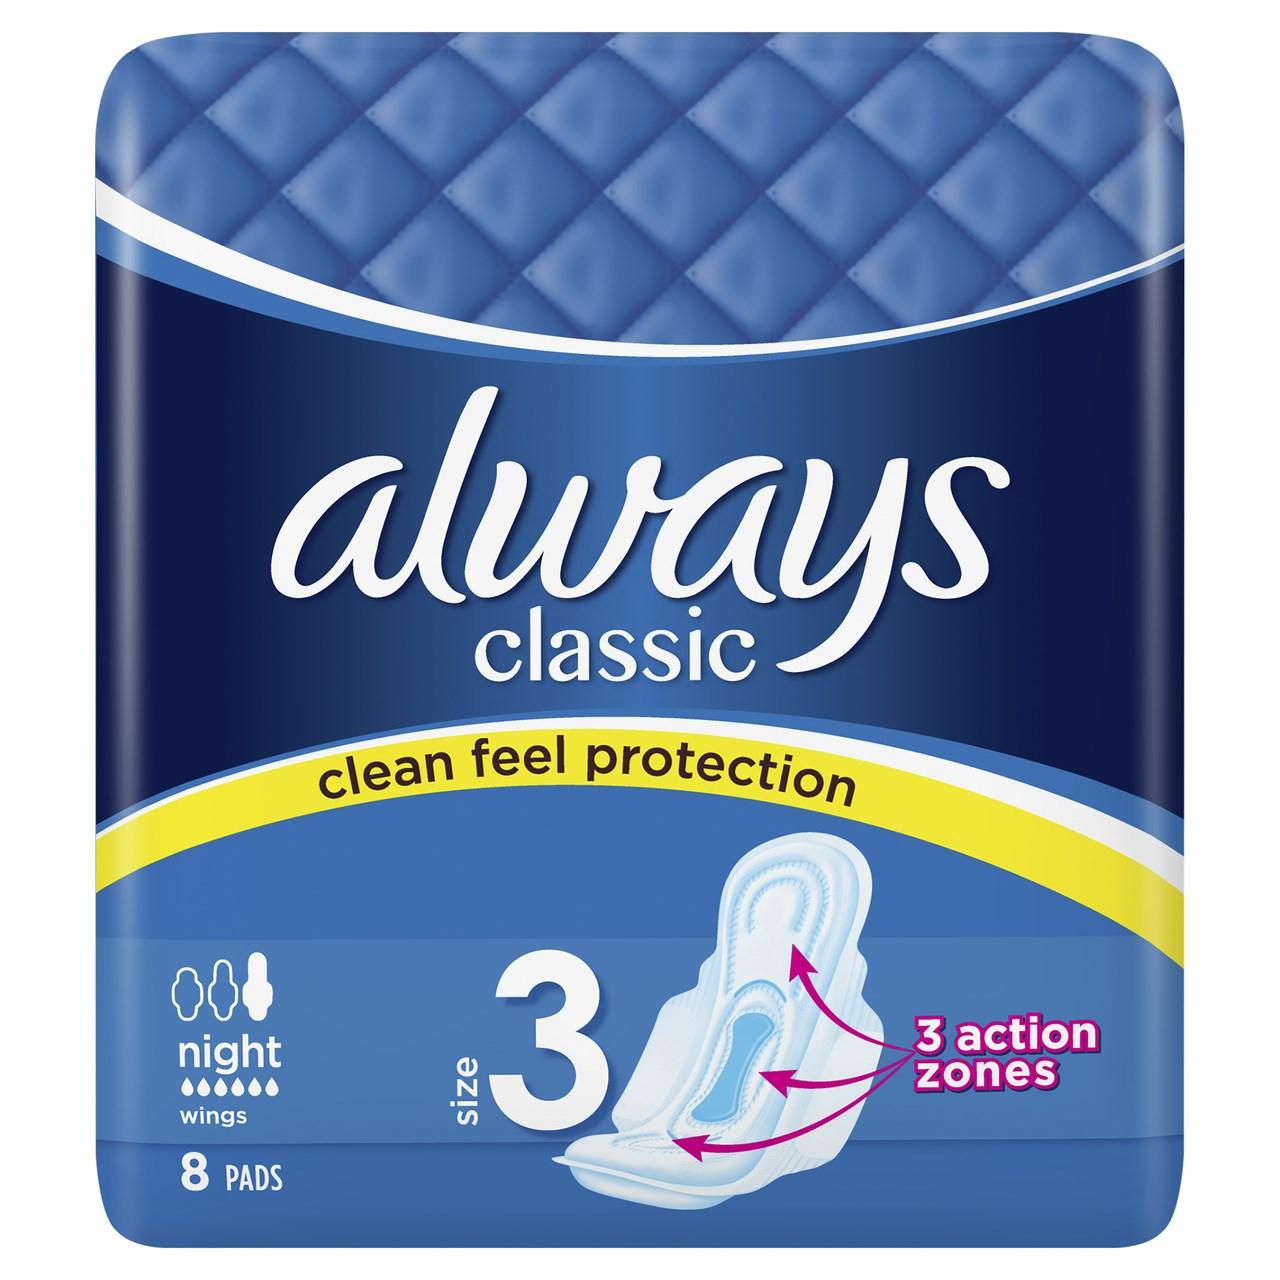 Always classic night dámske vložky 2x8 ks